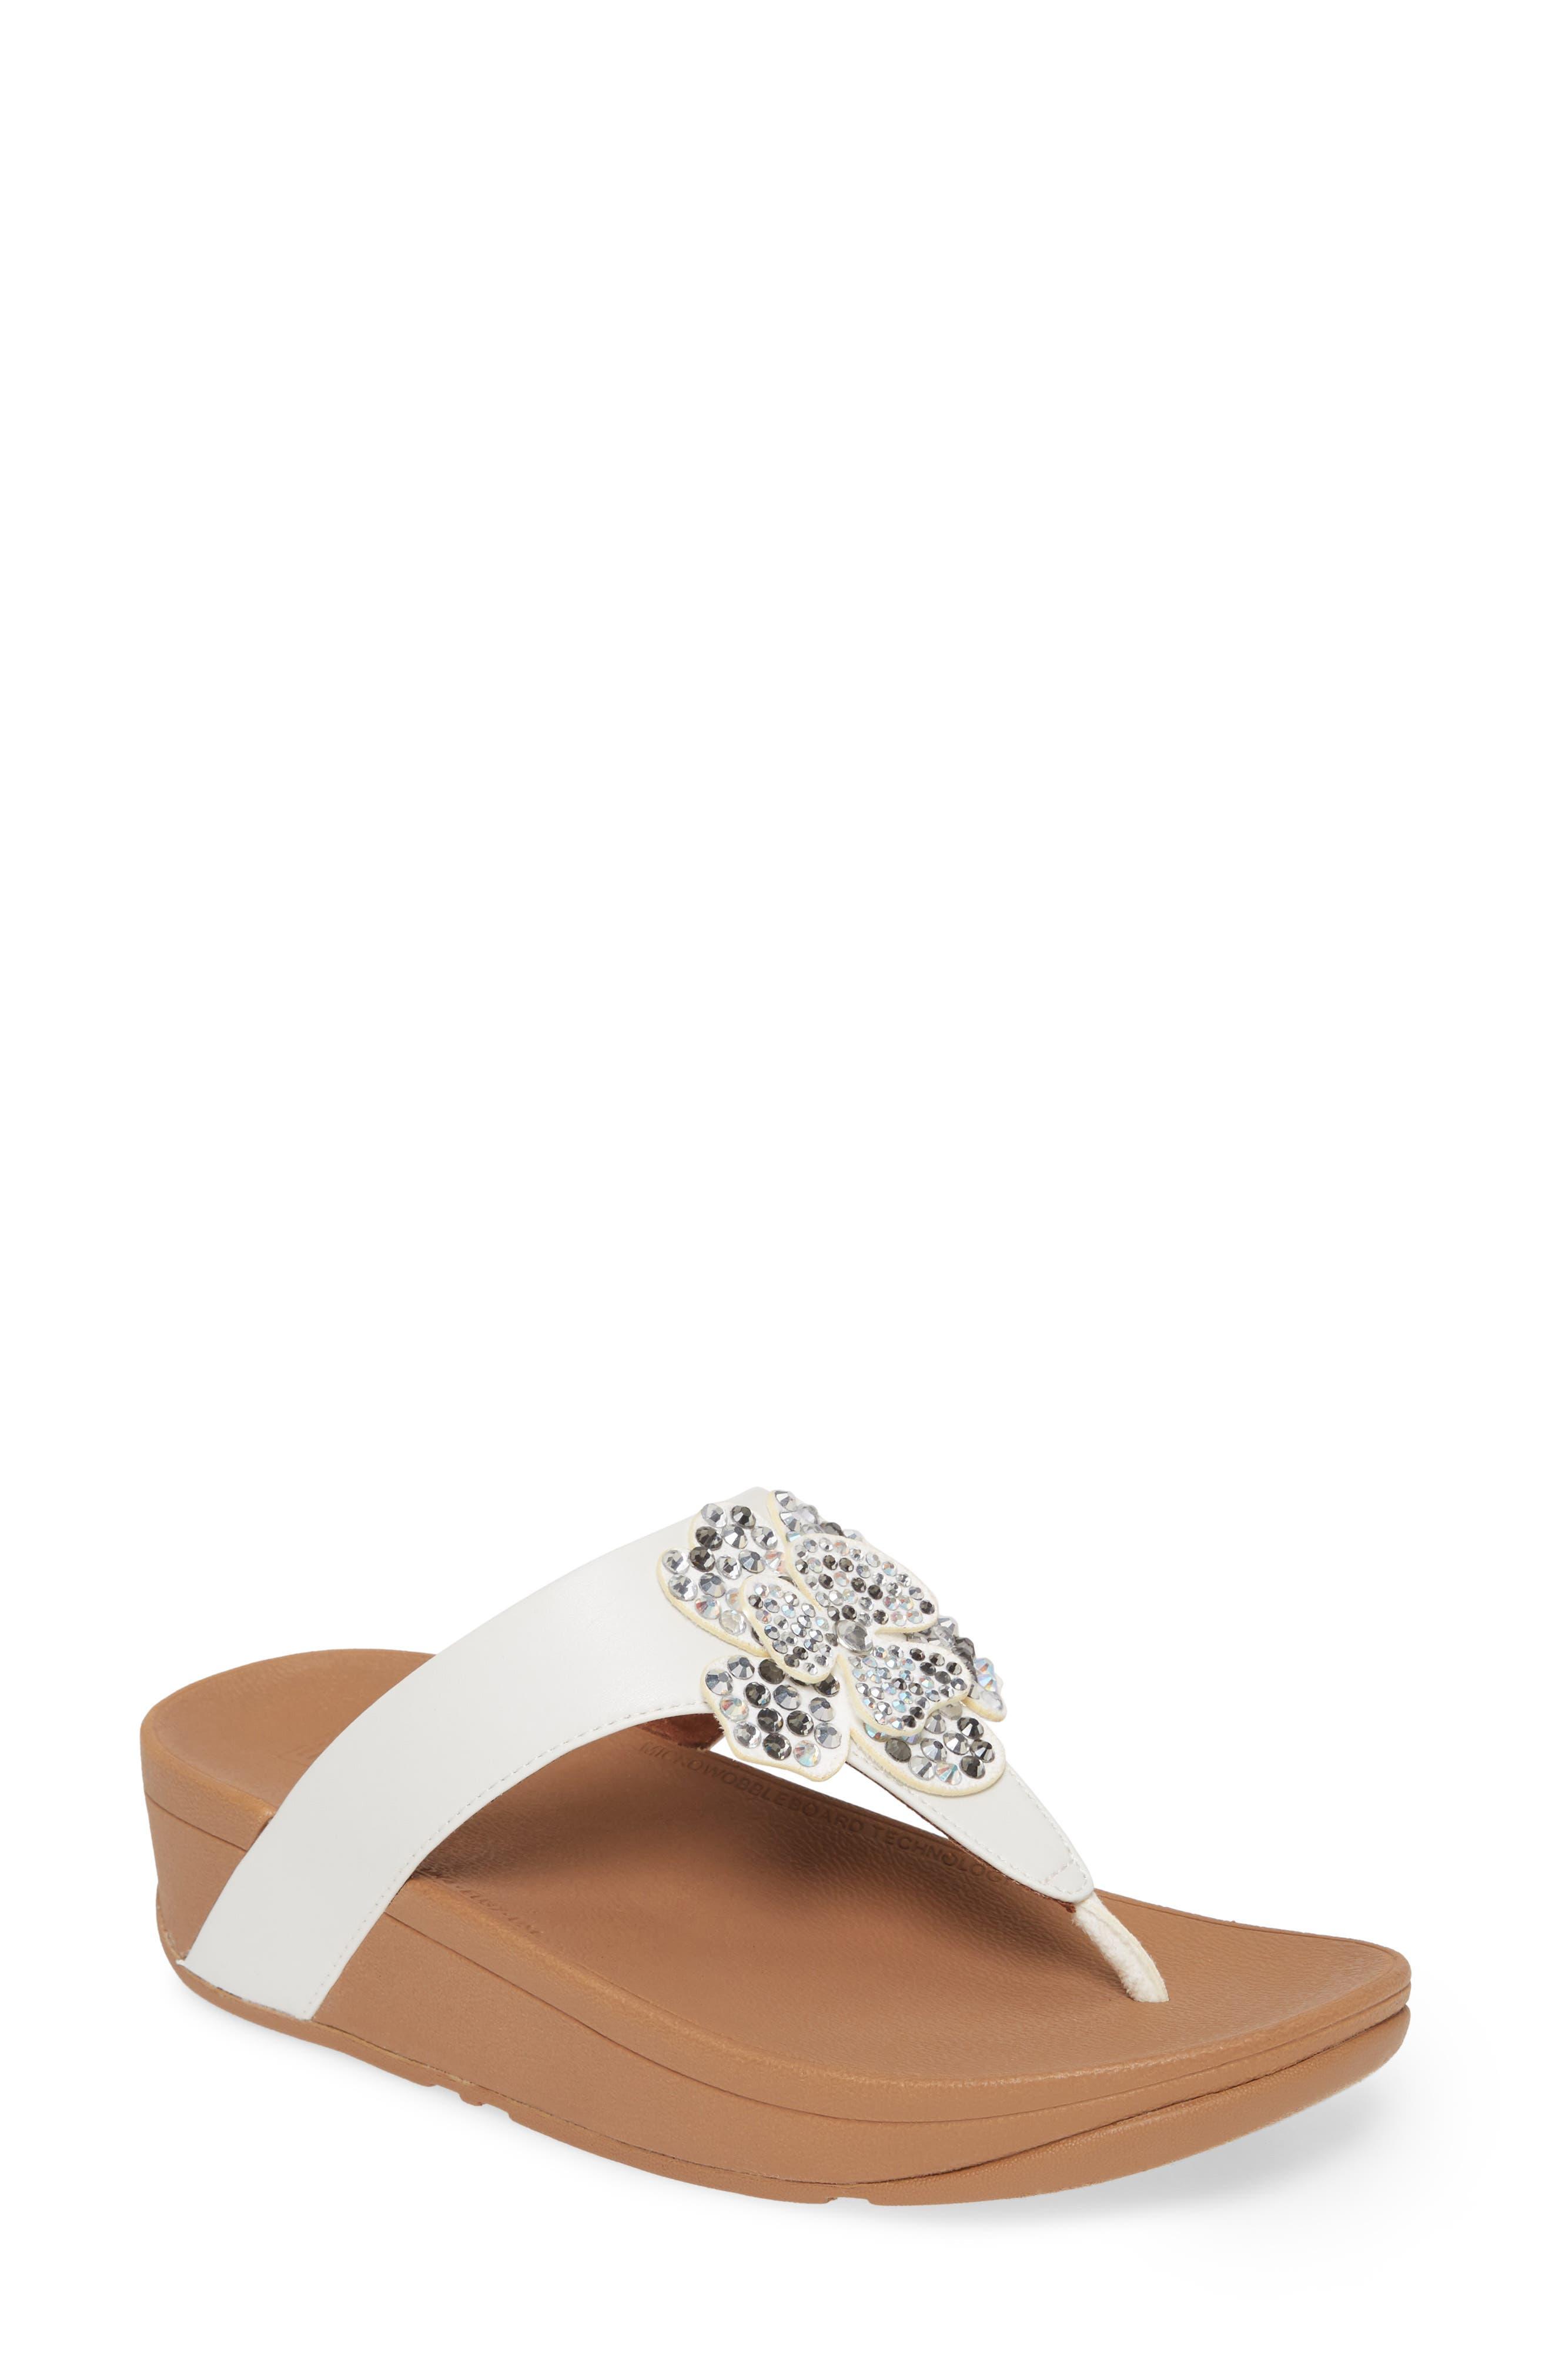 Women's FitFlop Shoes Sale \u0026 Clearance